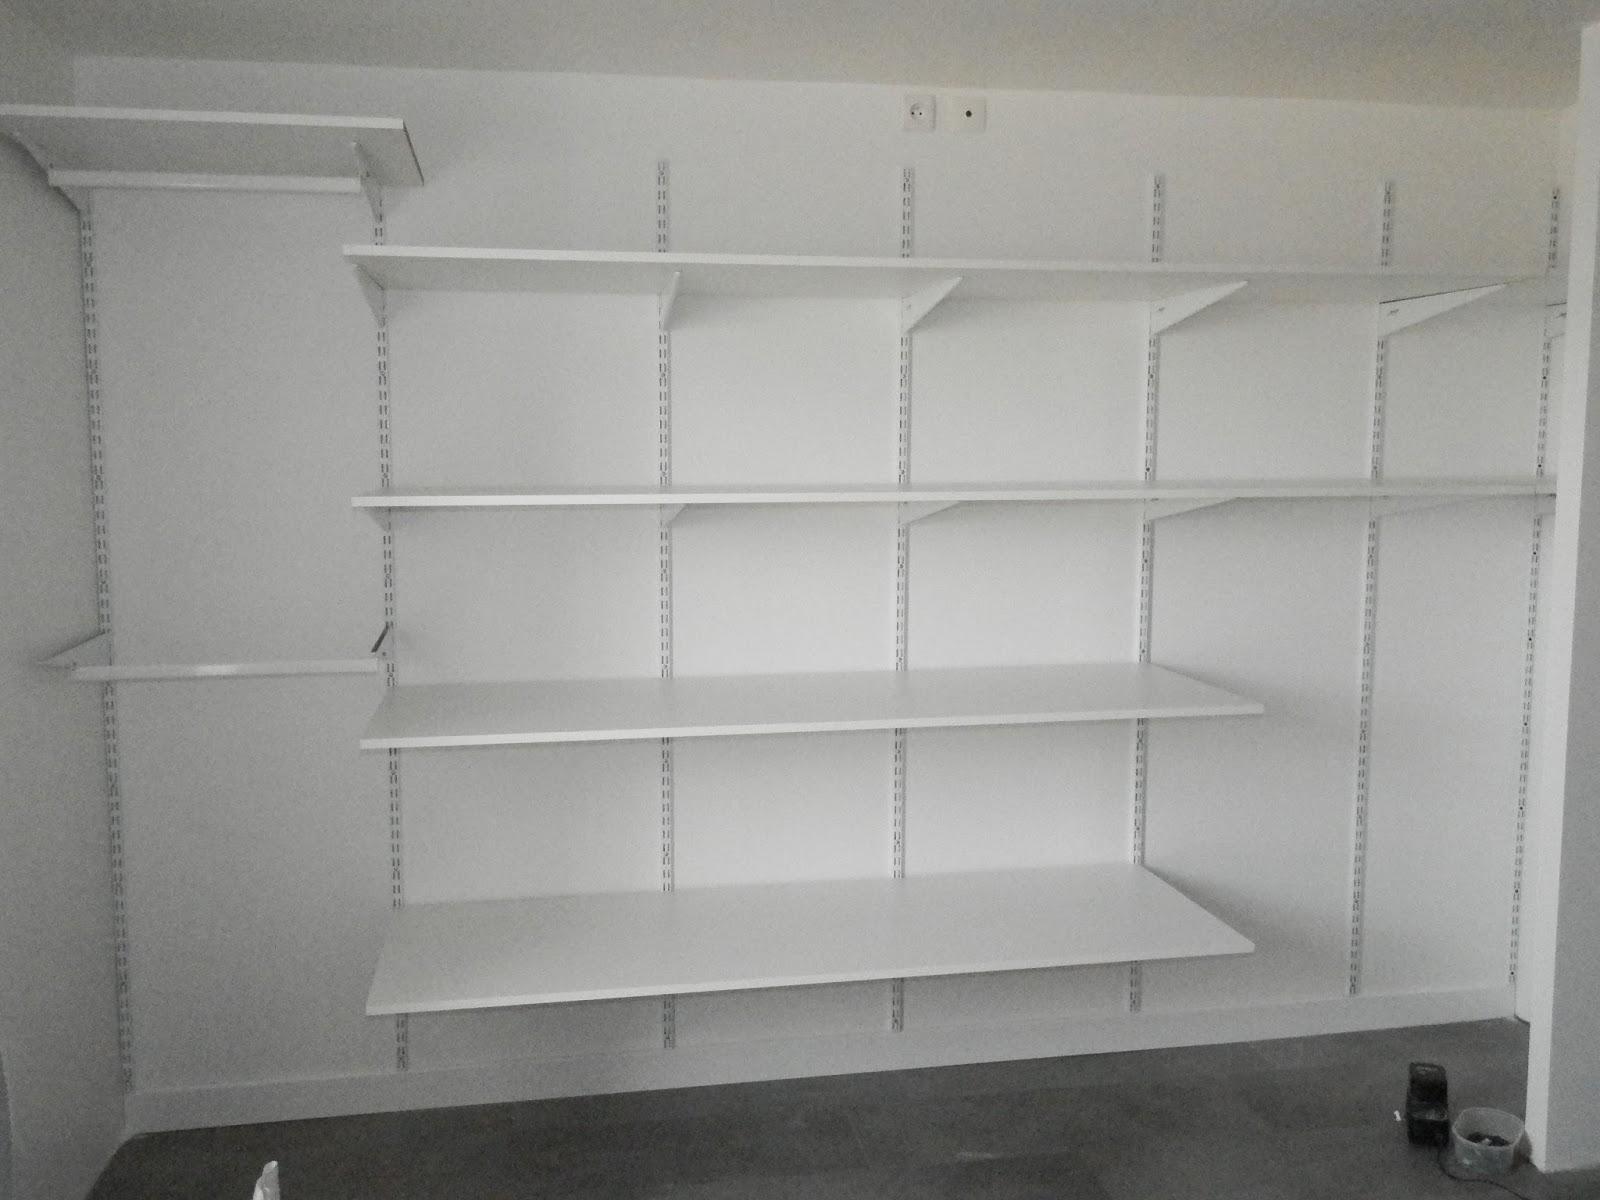 b t s am nagement placard xxl 3m40. Black Bedroom Furniture Sets. Home Design Ideas